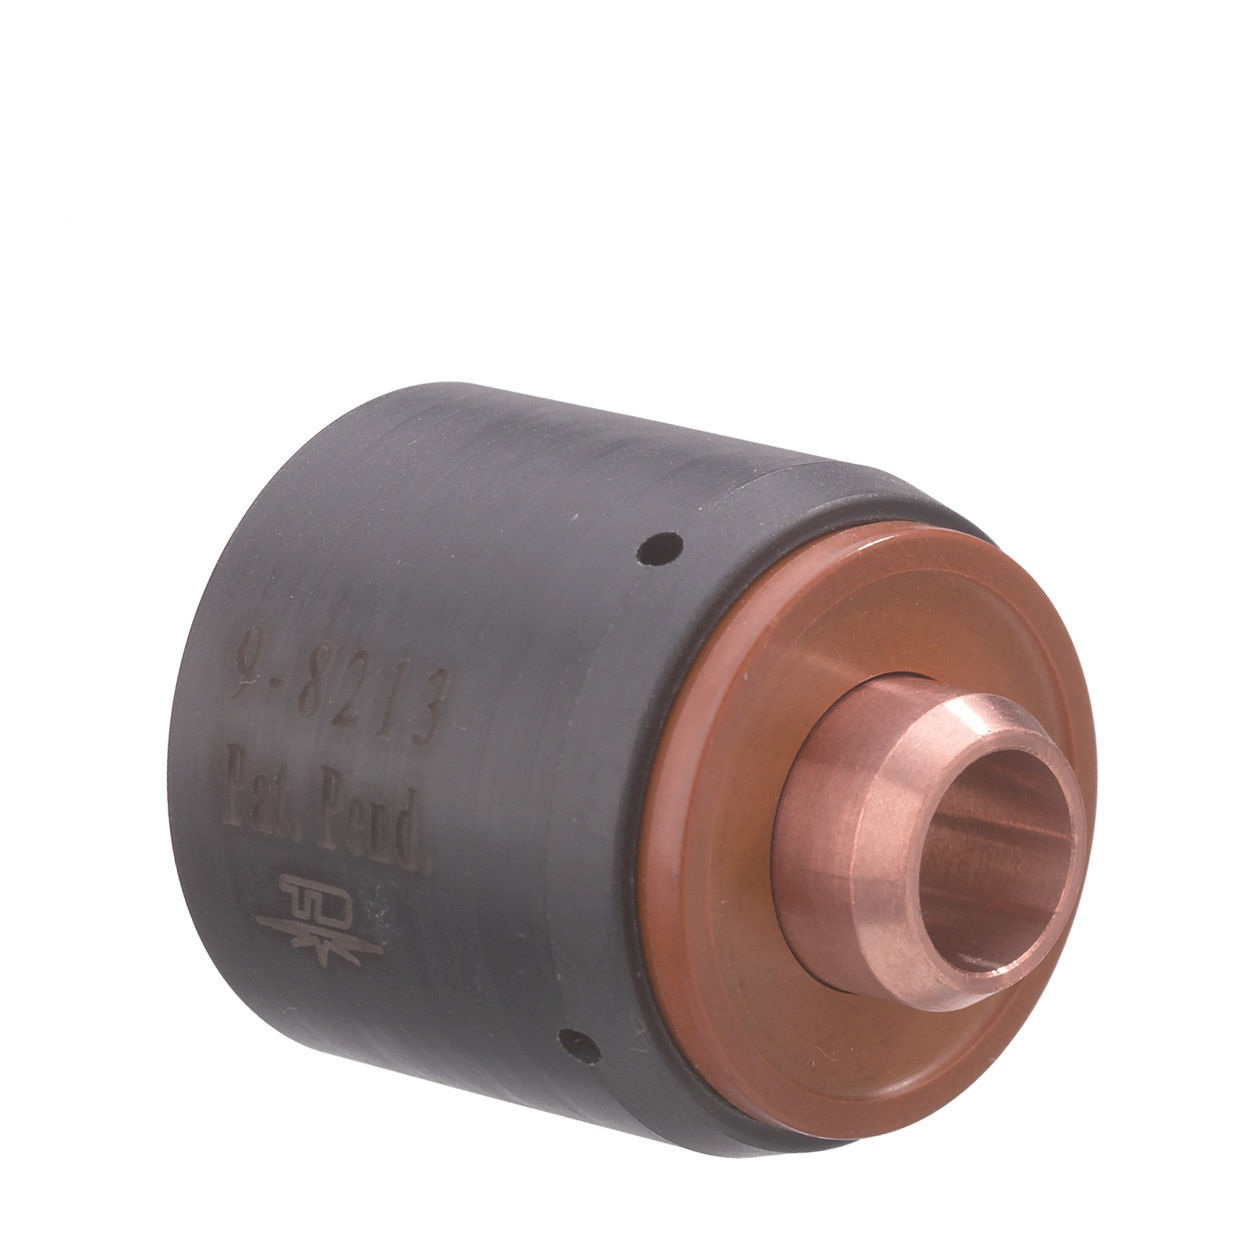 cartucho-cutmaster-730805-9-8213